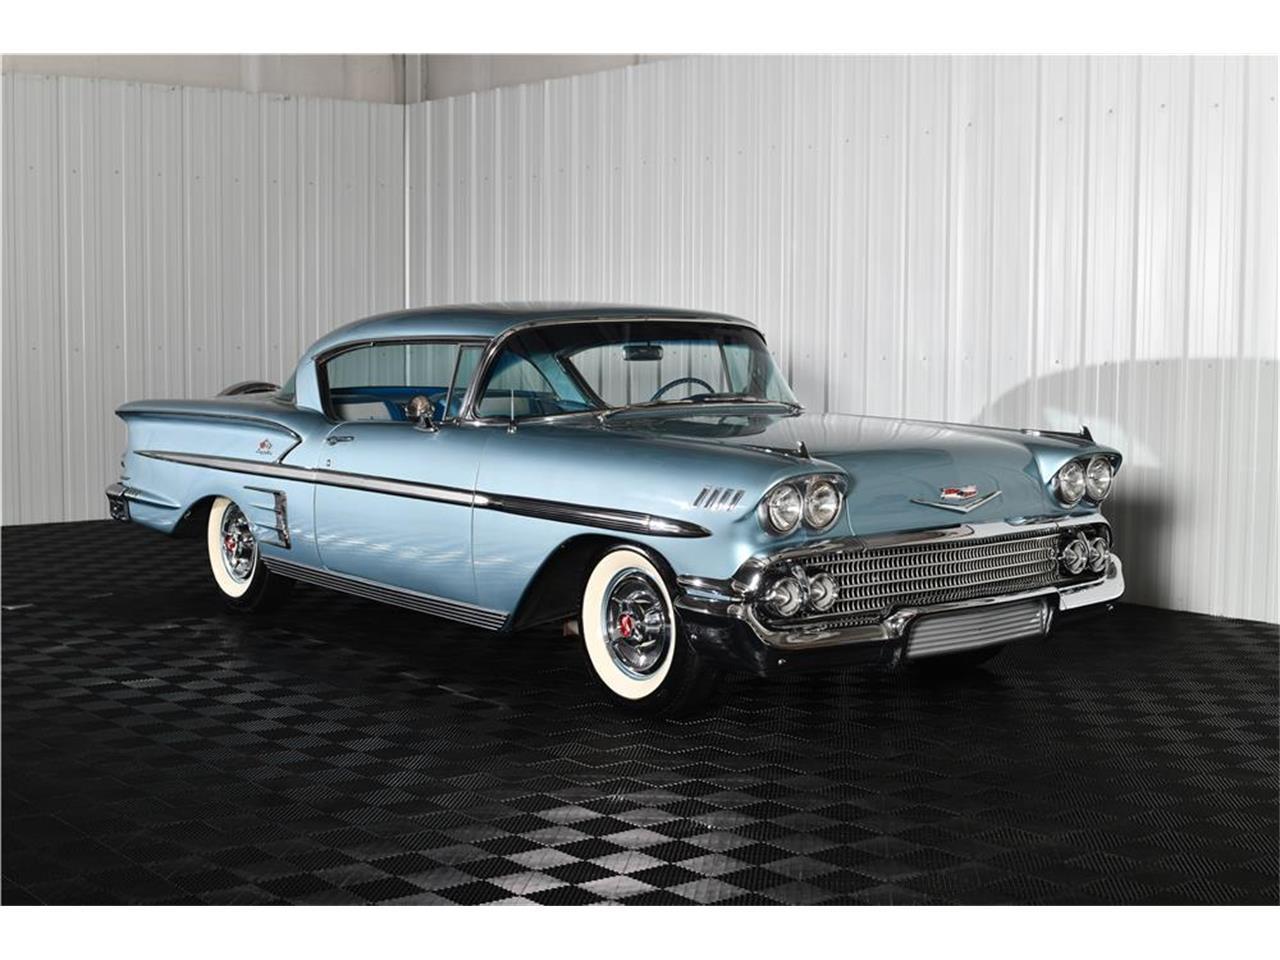 1958 chevrolet impala for sale cc 1136995. Black Bedroom Furniture Sets. Home Design Ideas